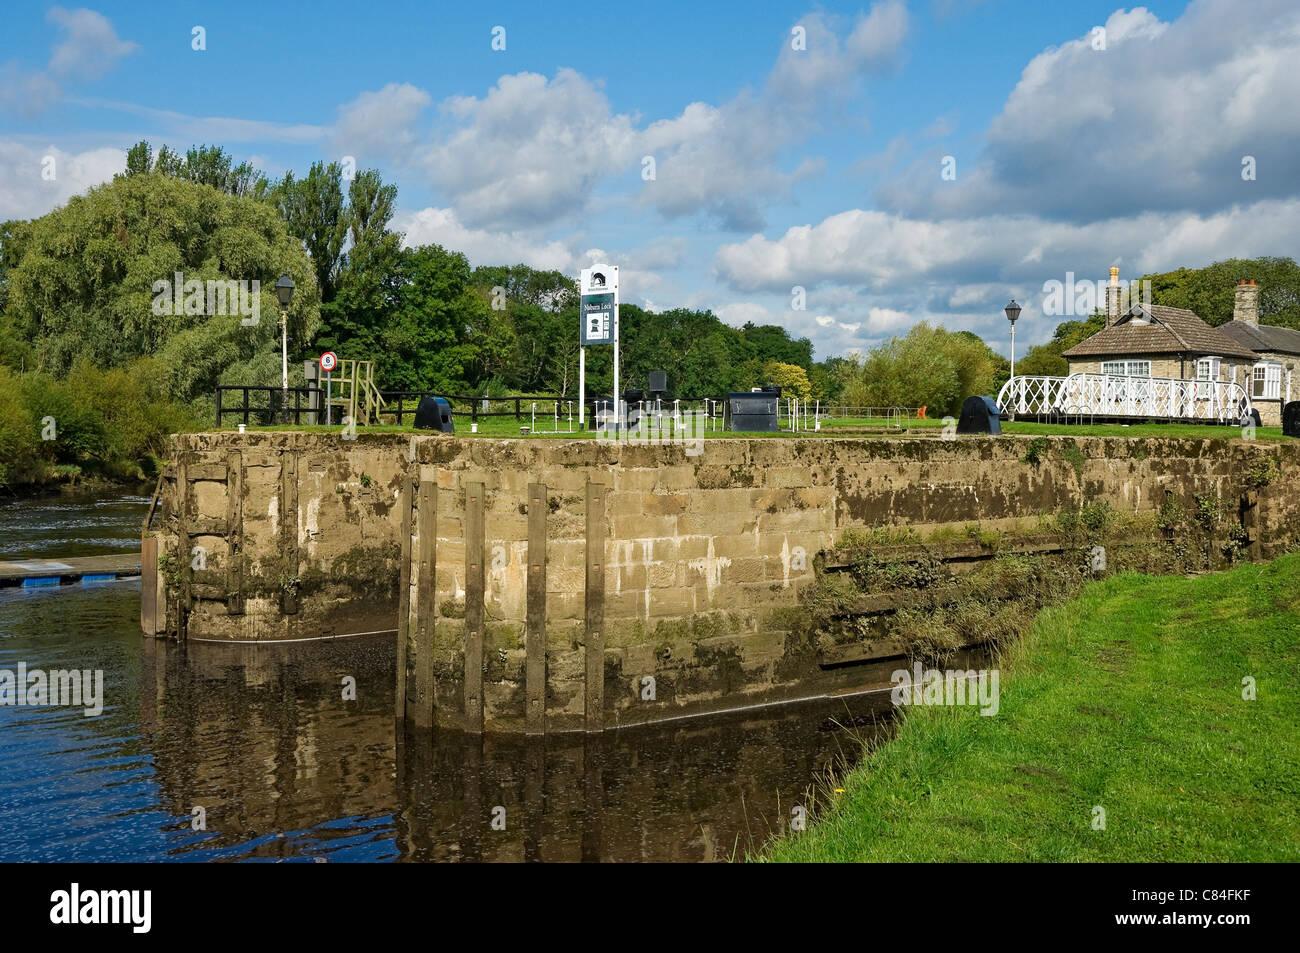 Naburn Lock on River Ouse near York North Yorkshire England UK United Kingdom GB Great Britain - Stock Image